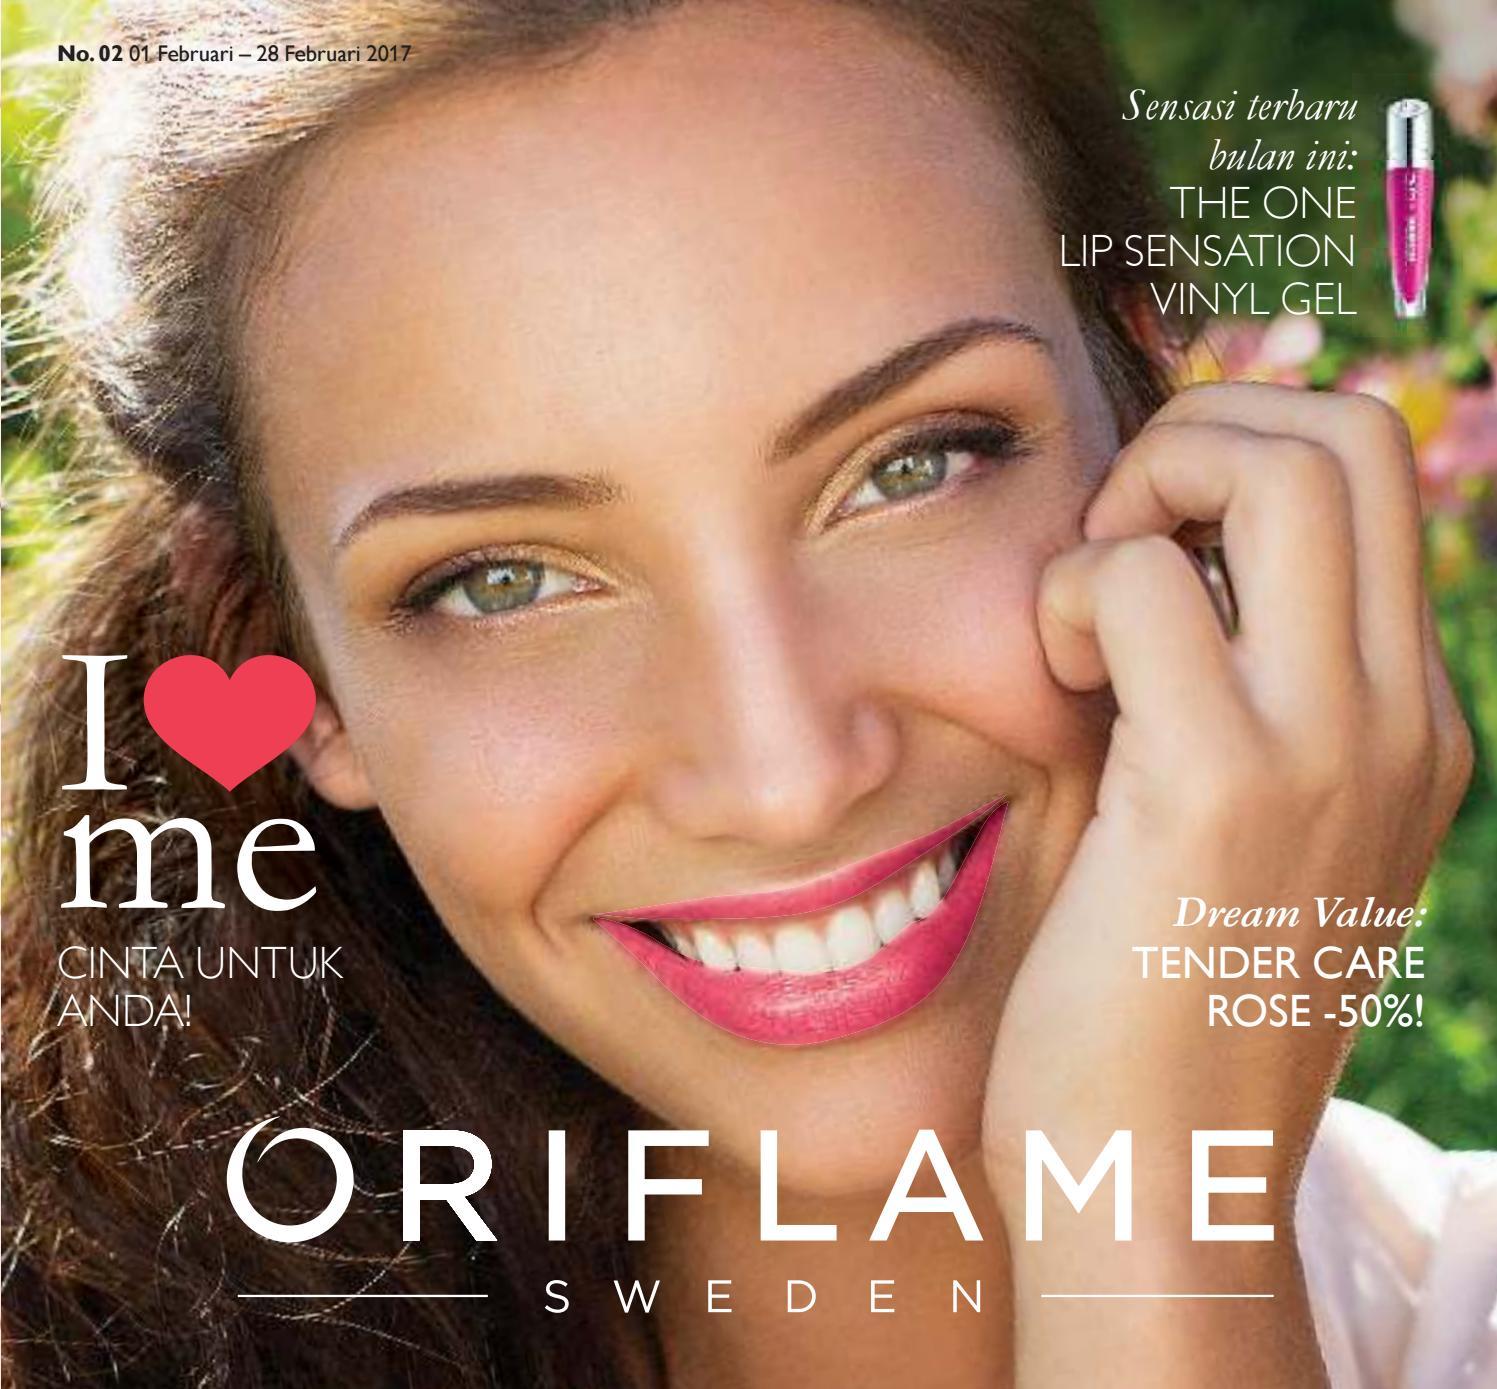 Katalog Oriflame Februari 2017 lipstik the one lip sensation vinyl gel by widi diah issuu